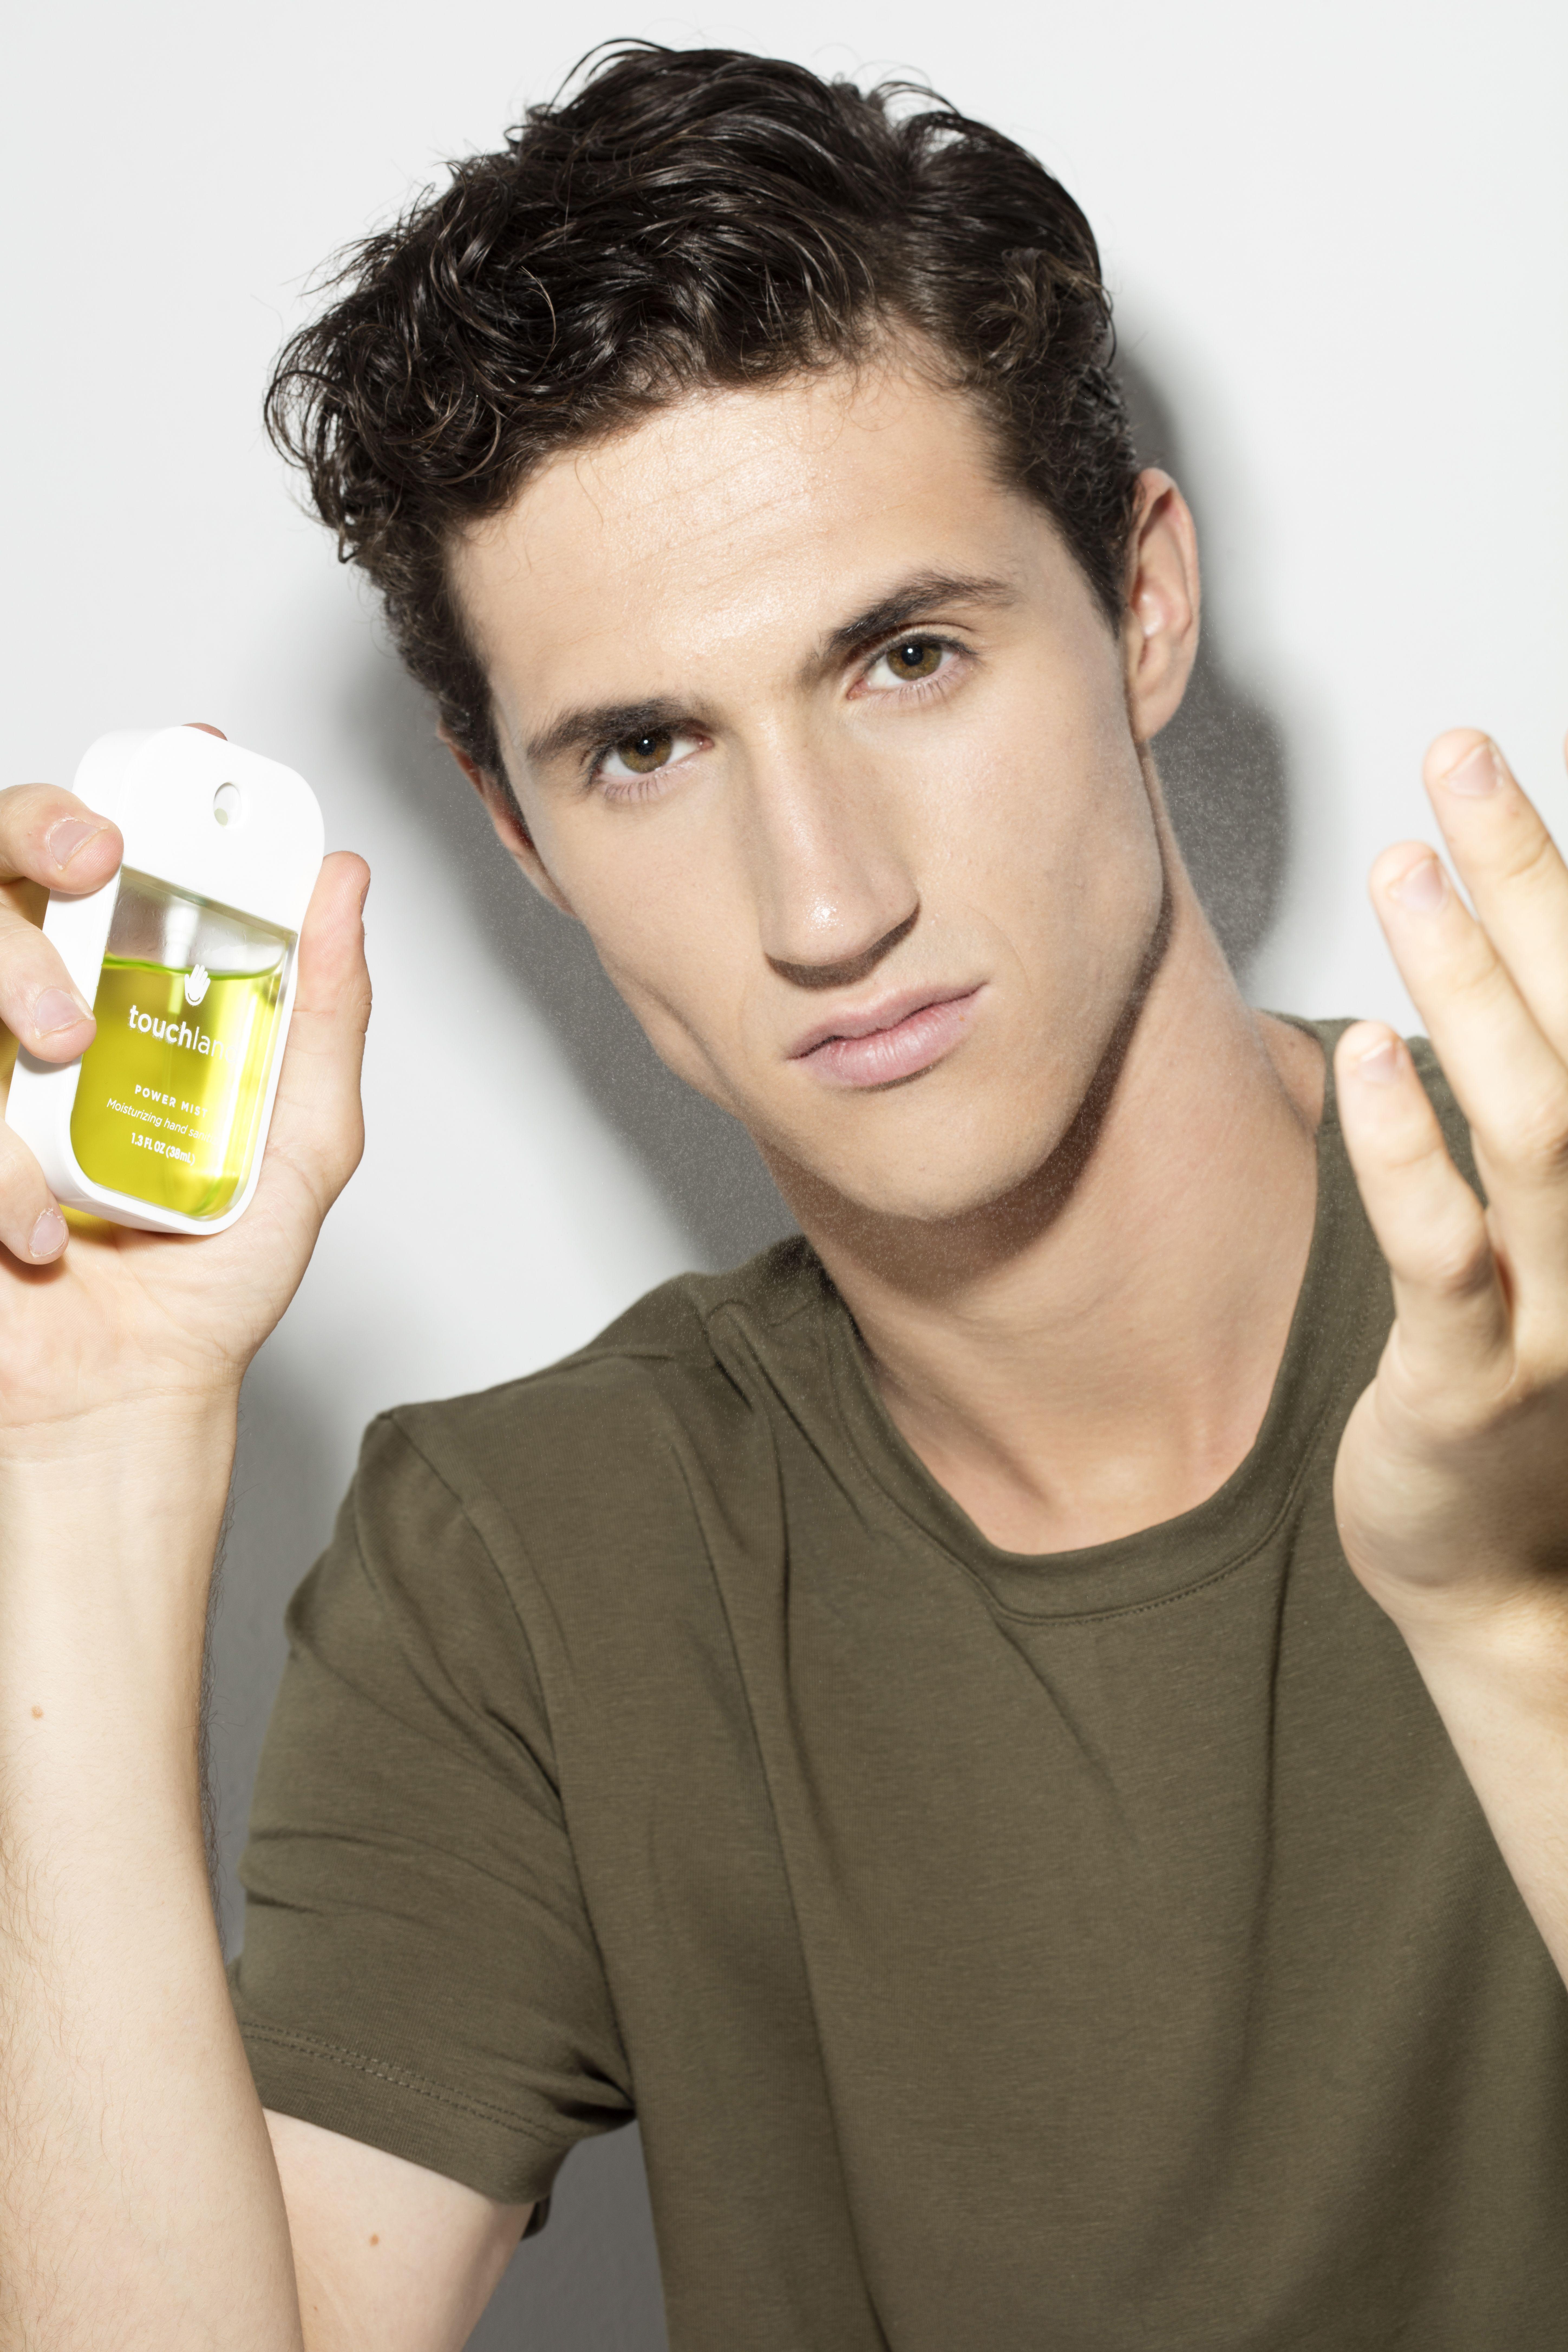 Amazing Offer On Purell Advanced Hand Sanitizer Refreshing Gel